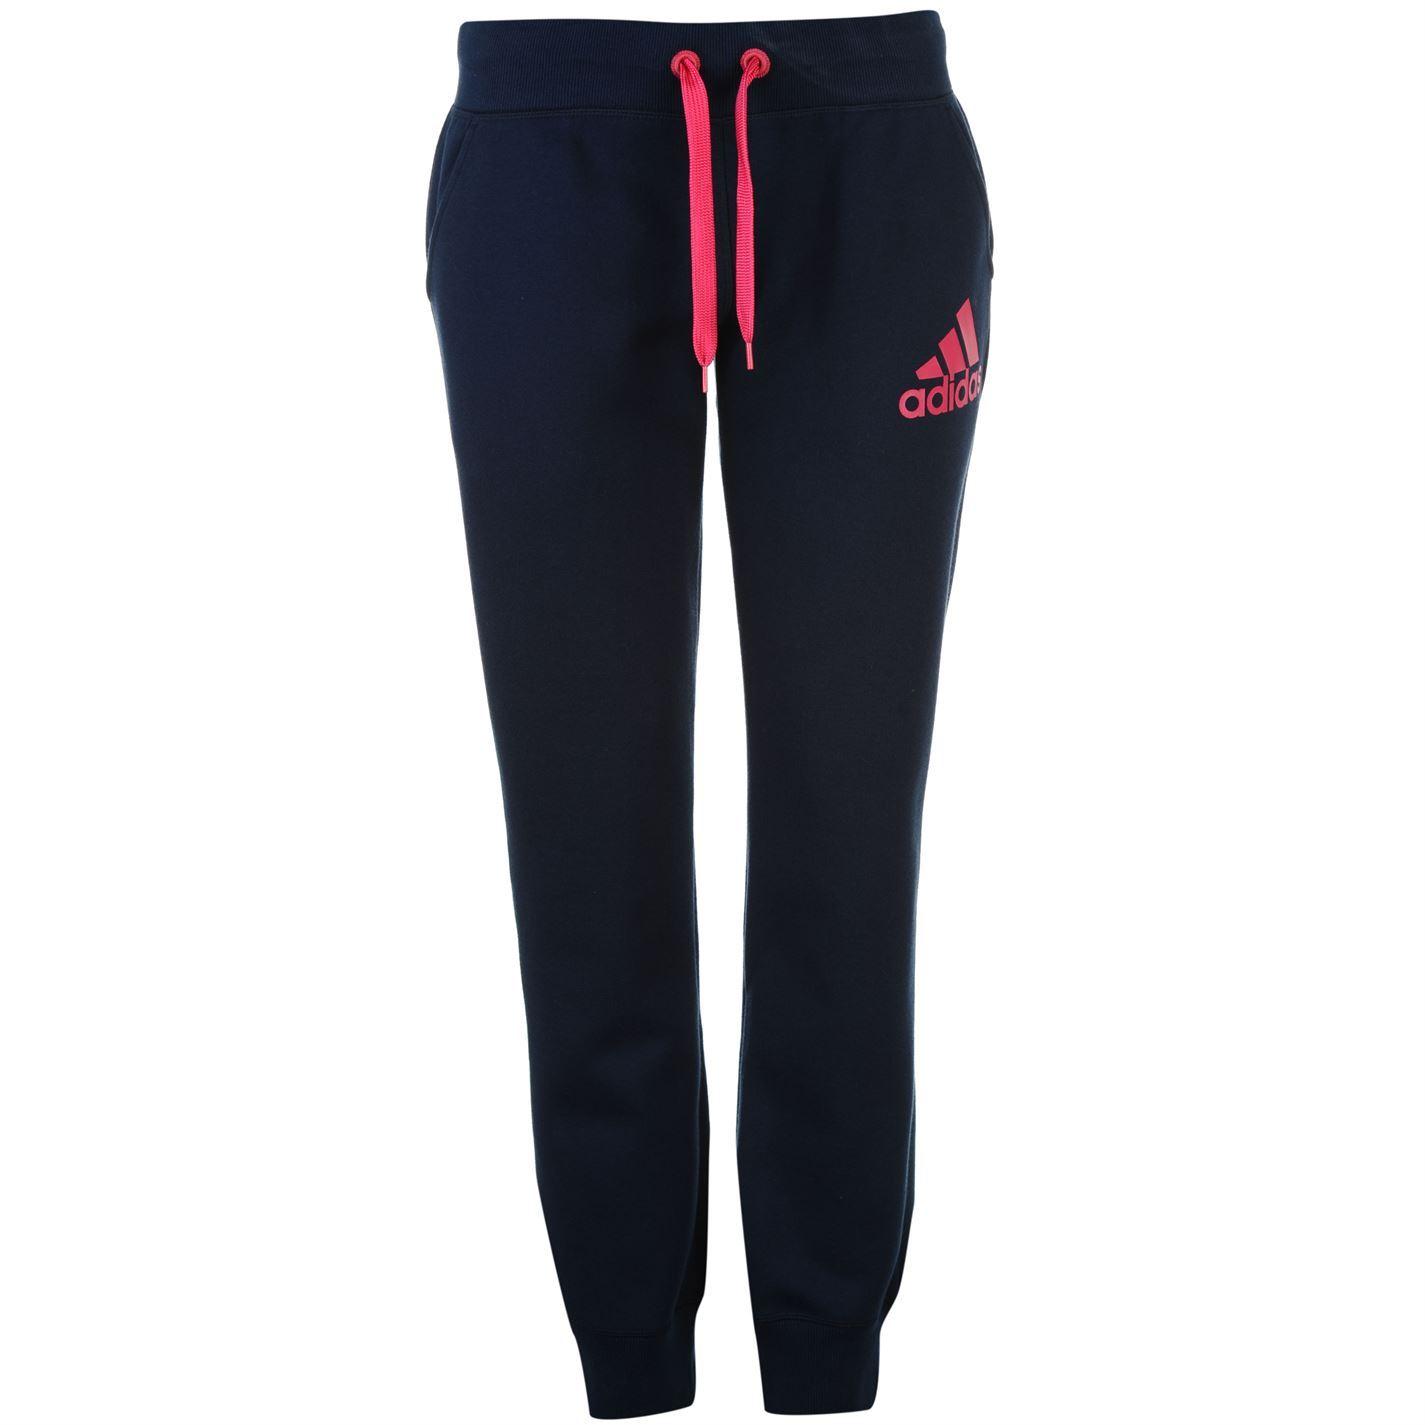 Fantastic Adidas Womens Tiro 13 Soccer Training Pant BlackSolar Pink